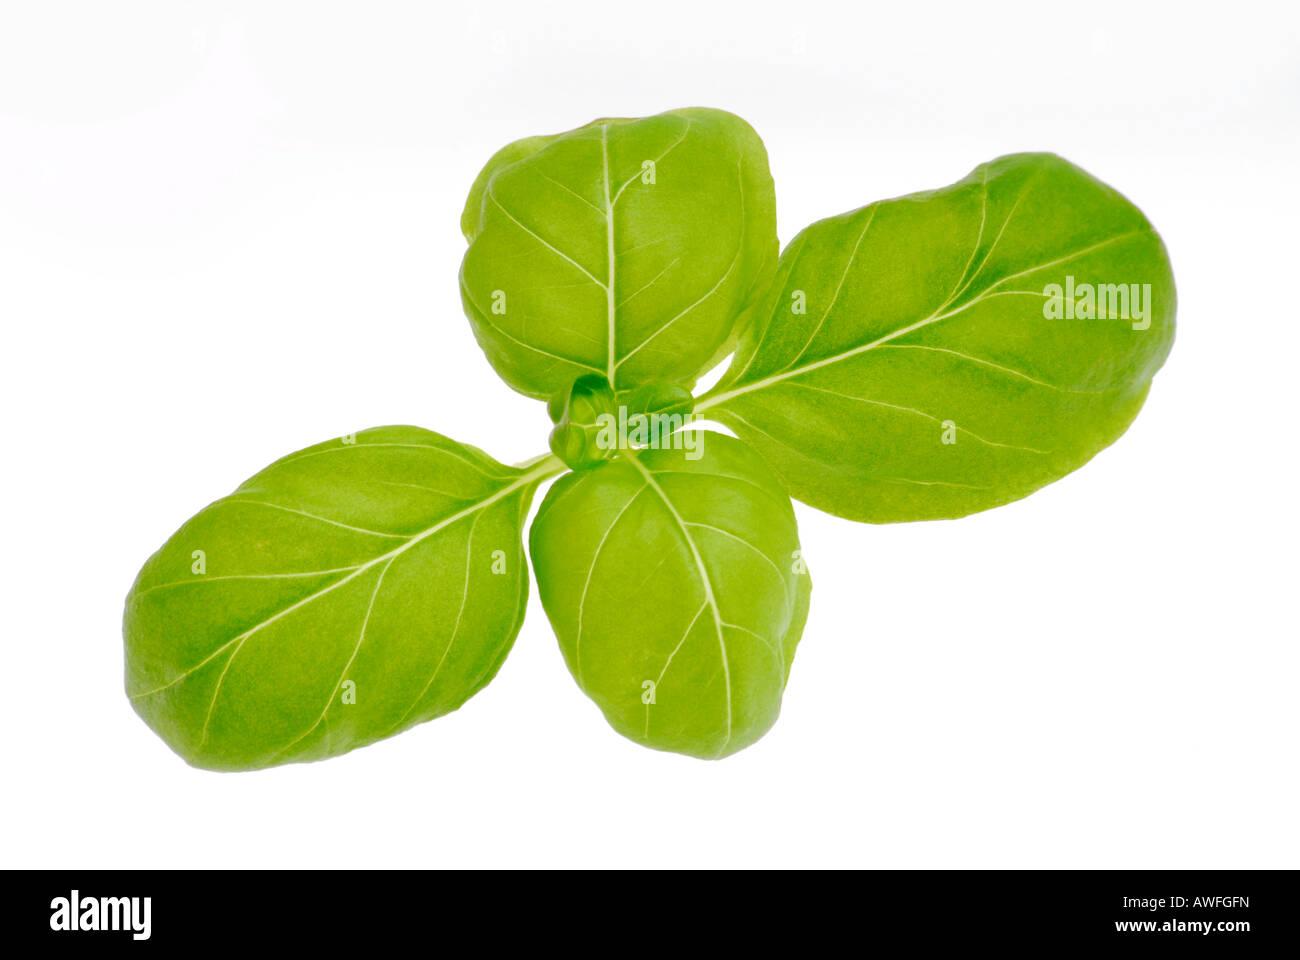 Basil (Ocimum basilicum) - Stock Image